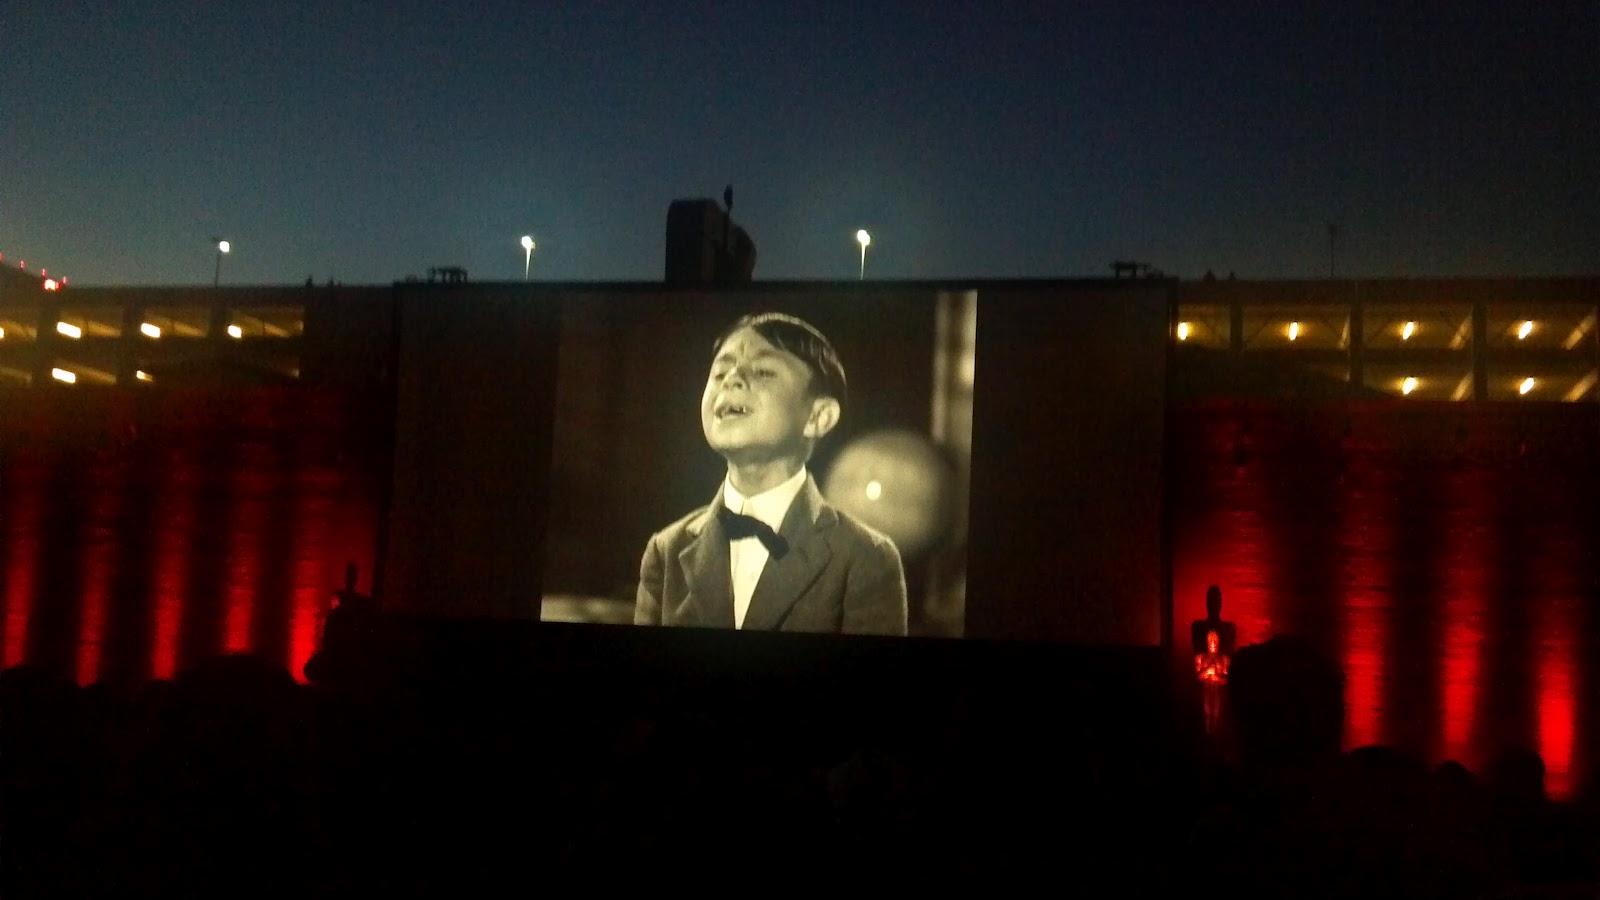 Outdoor Movie Clipart Outdoor movie night clip art